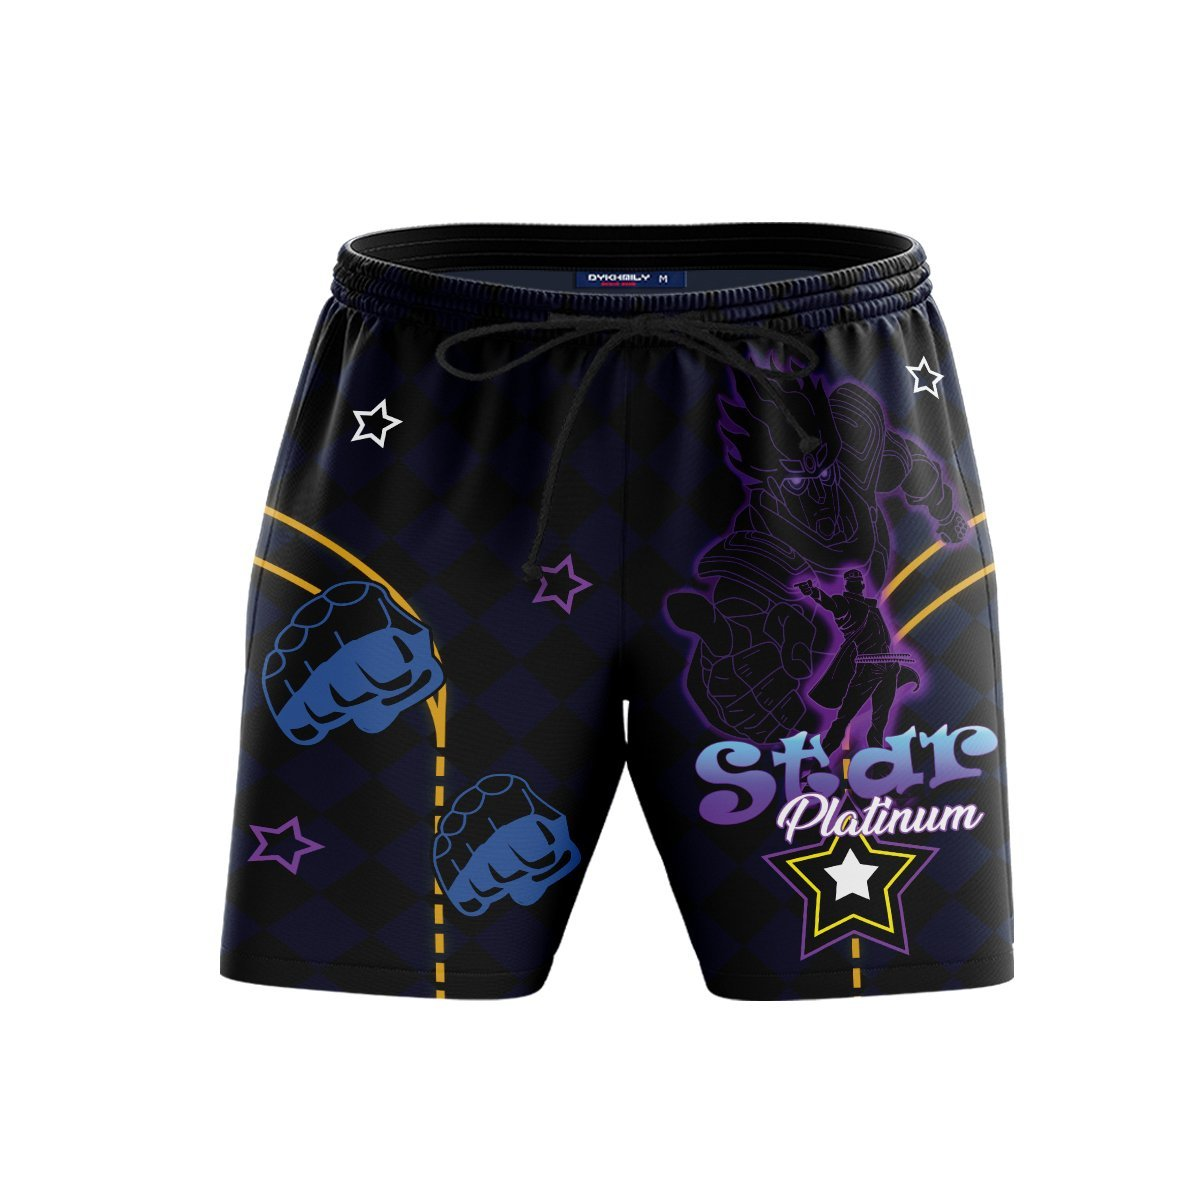 Star Platinum Beach Shorts FDM3107 S Official Anime Swimsuit Merch